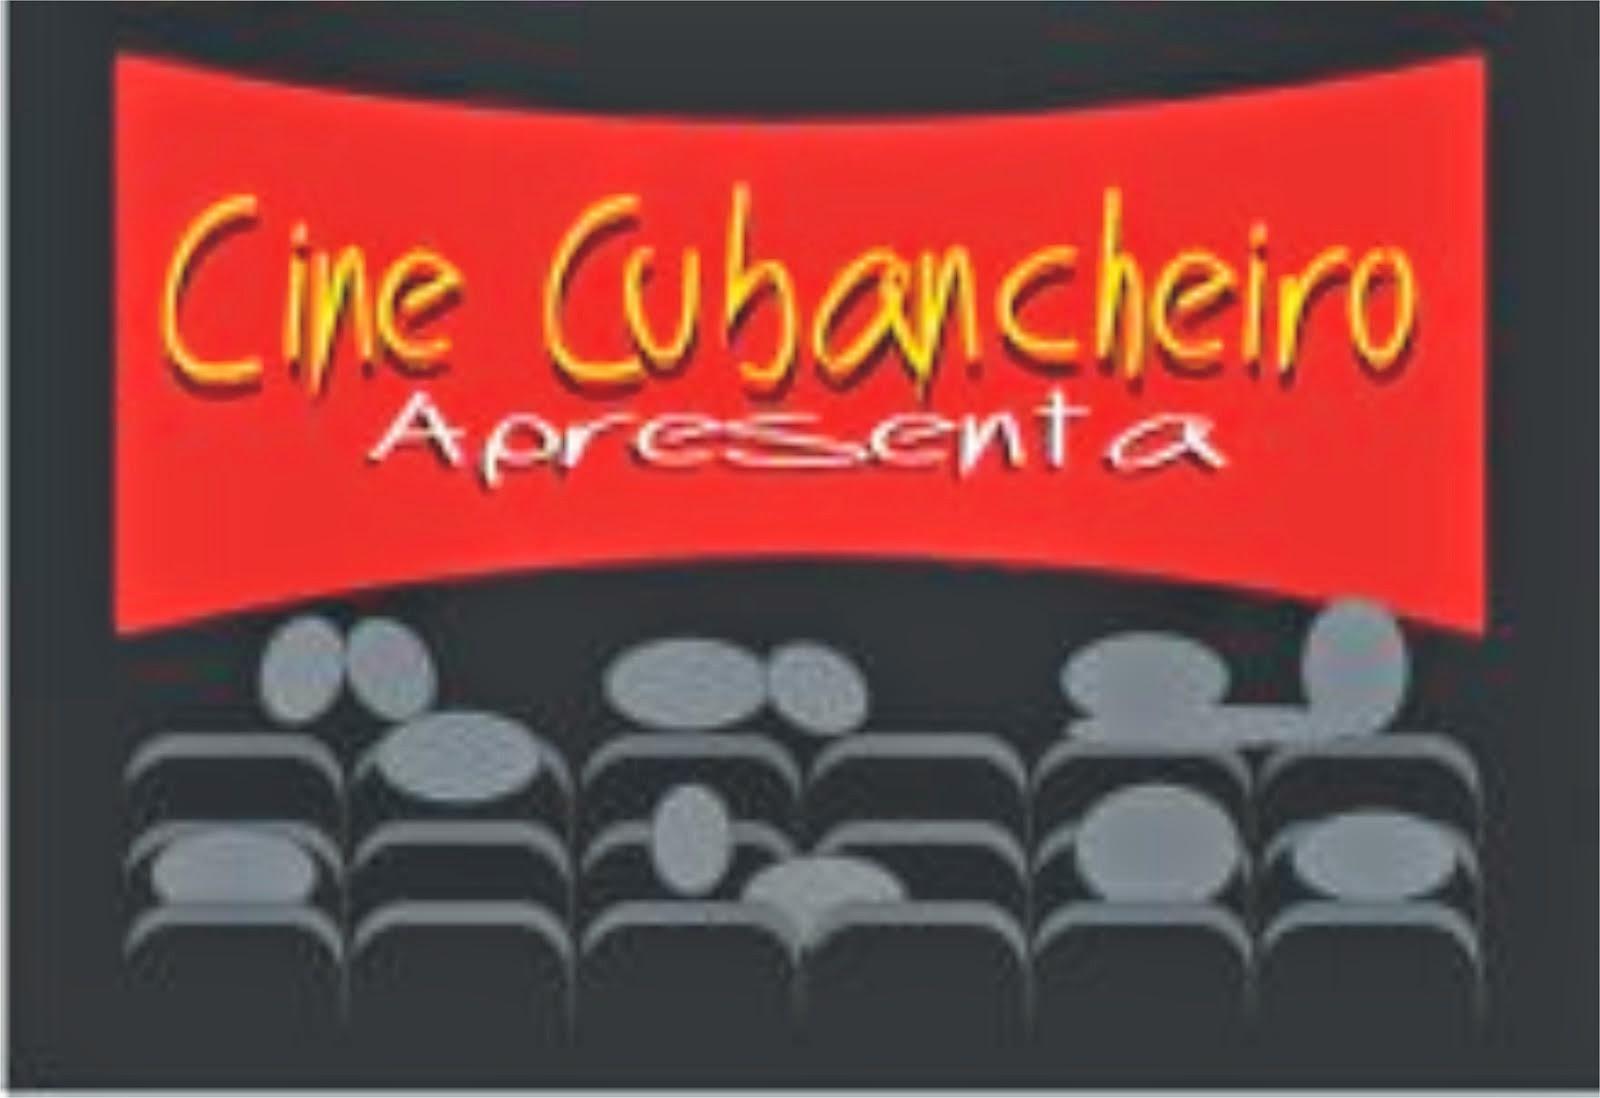 CINE CUBANCHEIRO